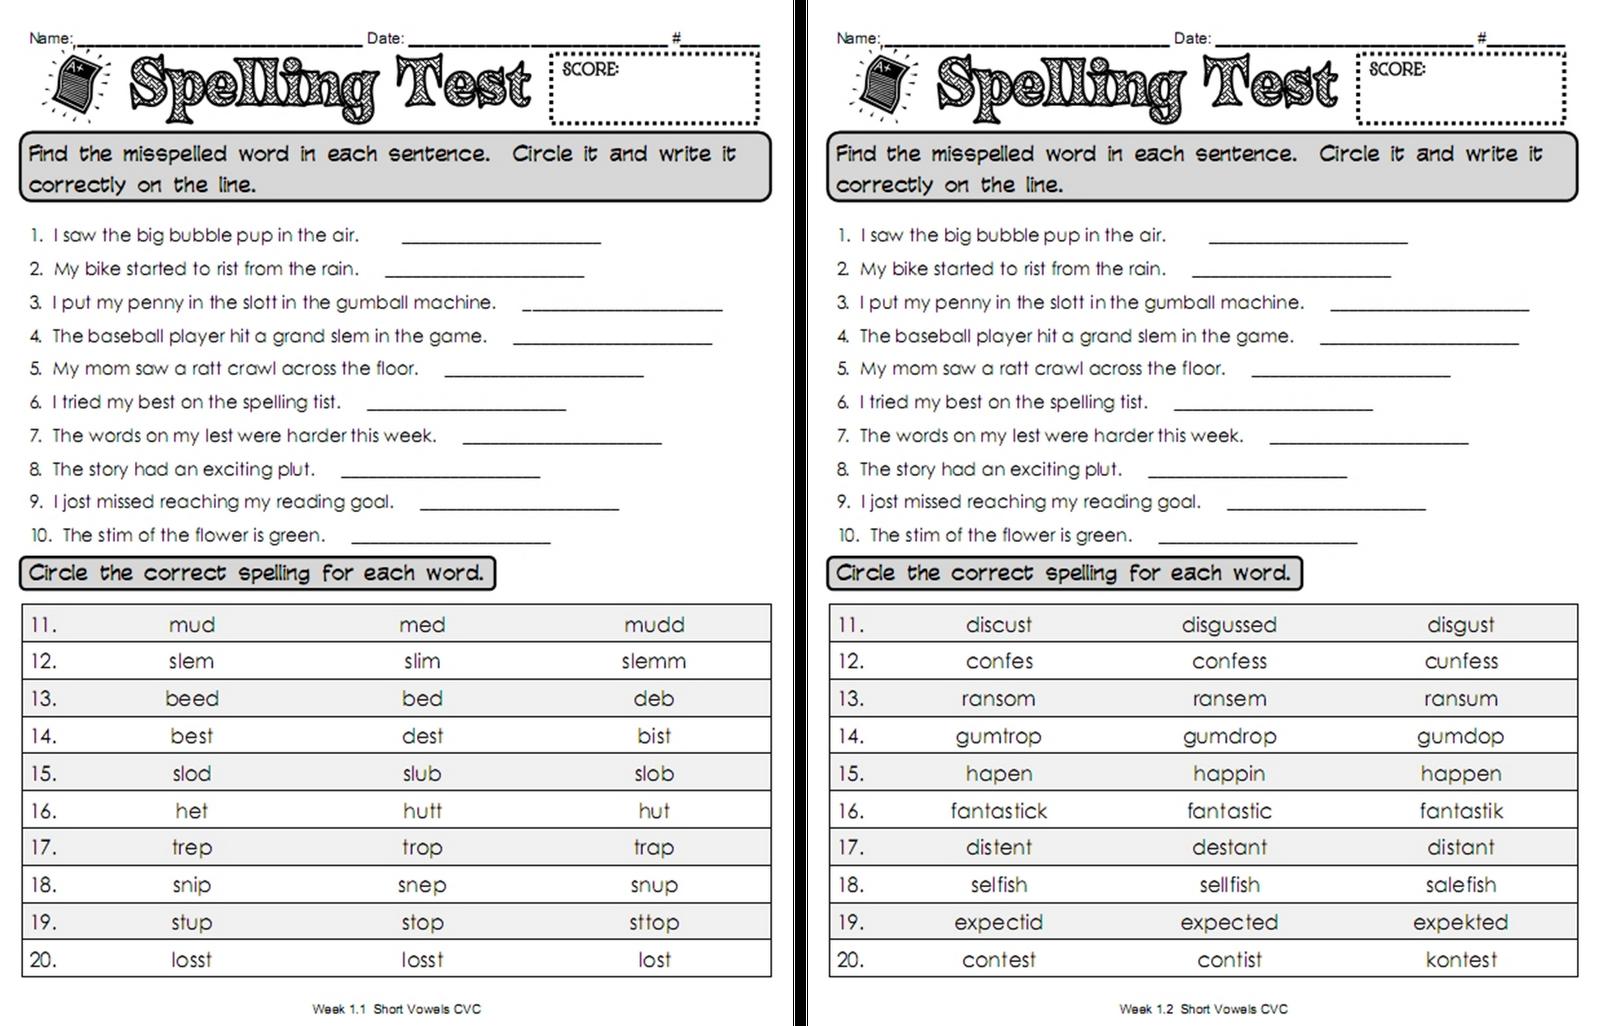 Test Template Word test format template ieee std 829 test plan – Word Test Template